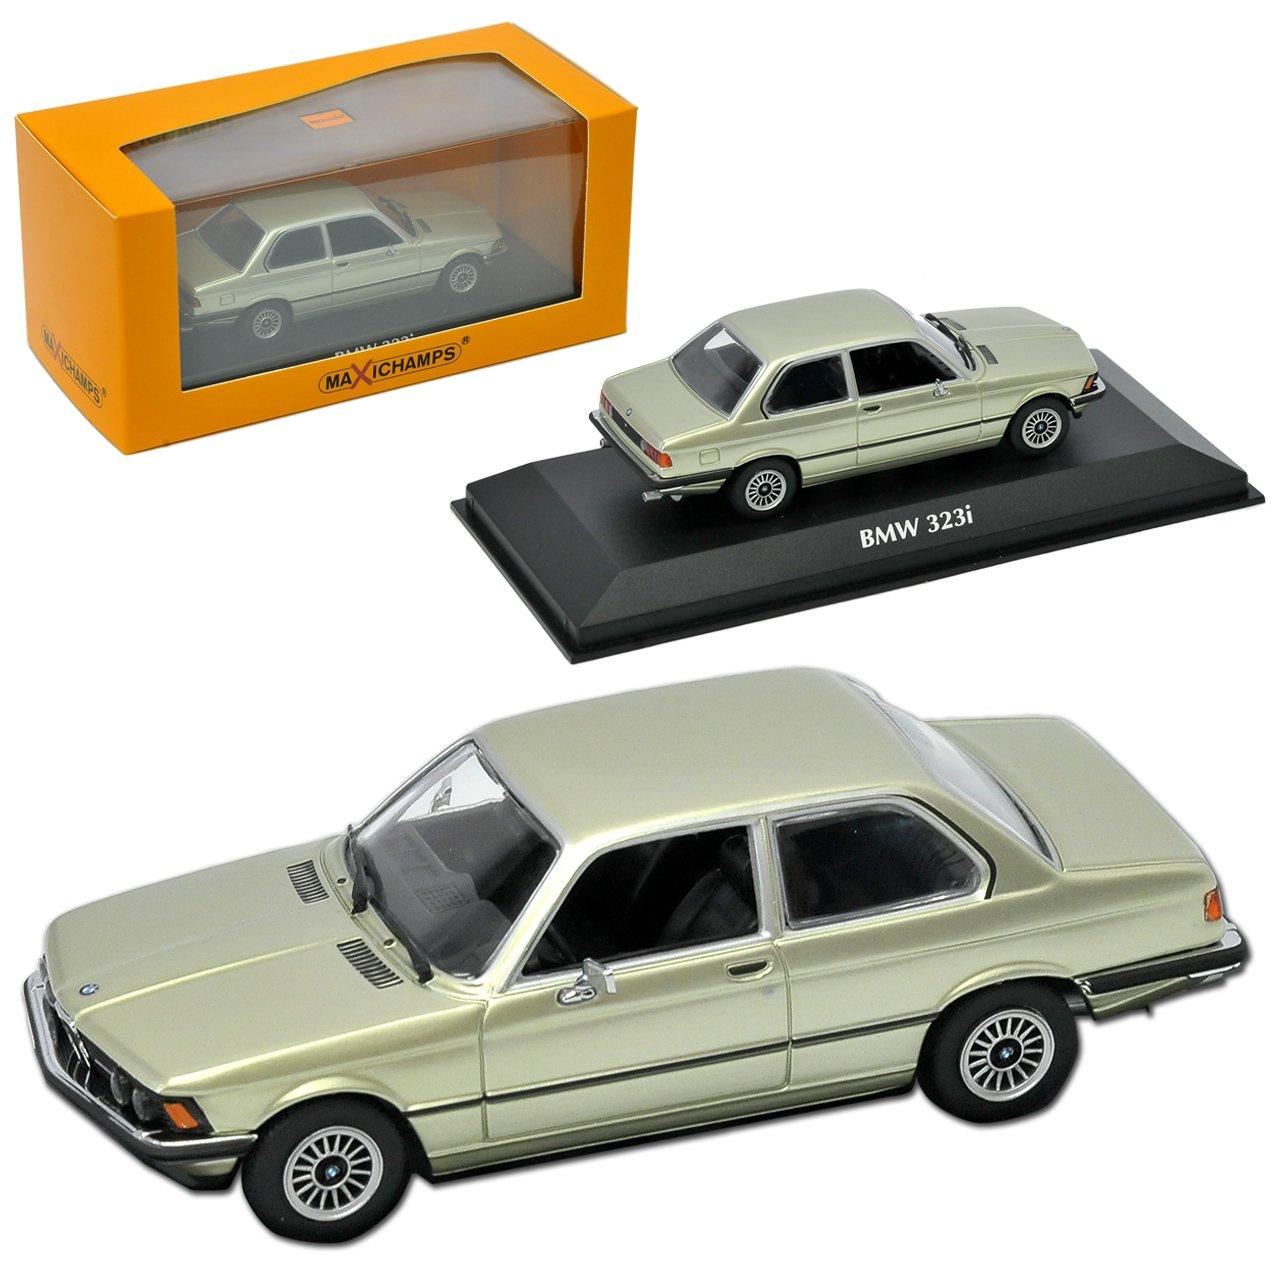 BMW 3er E21 323i Coupe Grün Metallic 1975-1983 1/43 Minichamps Maxichamps Modell Auto mit individiuellem Wunschkennzeichen